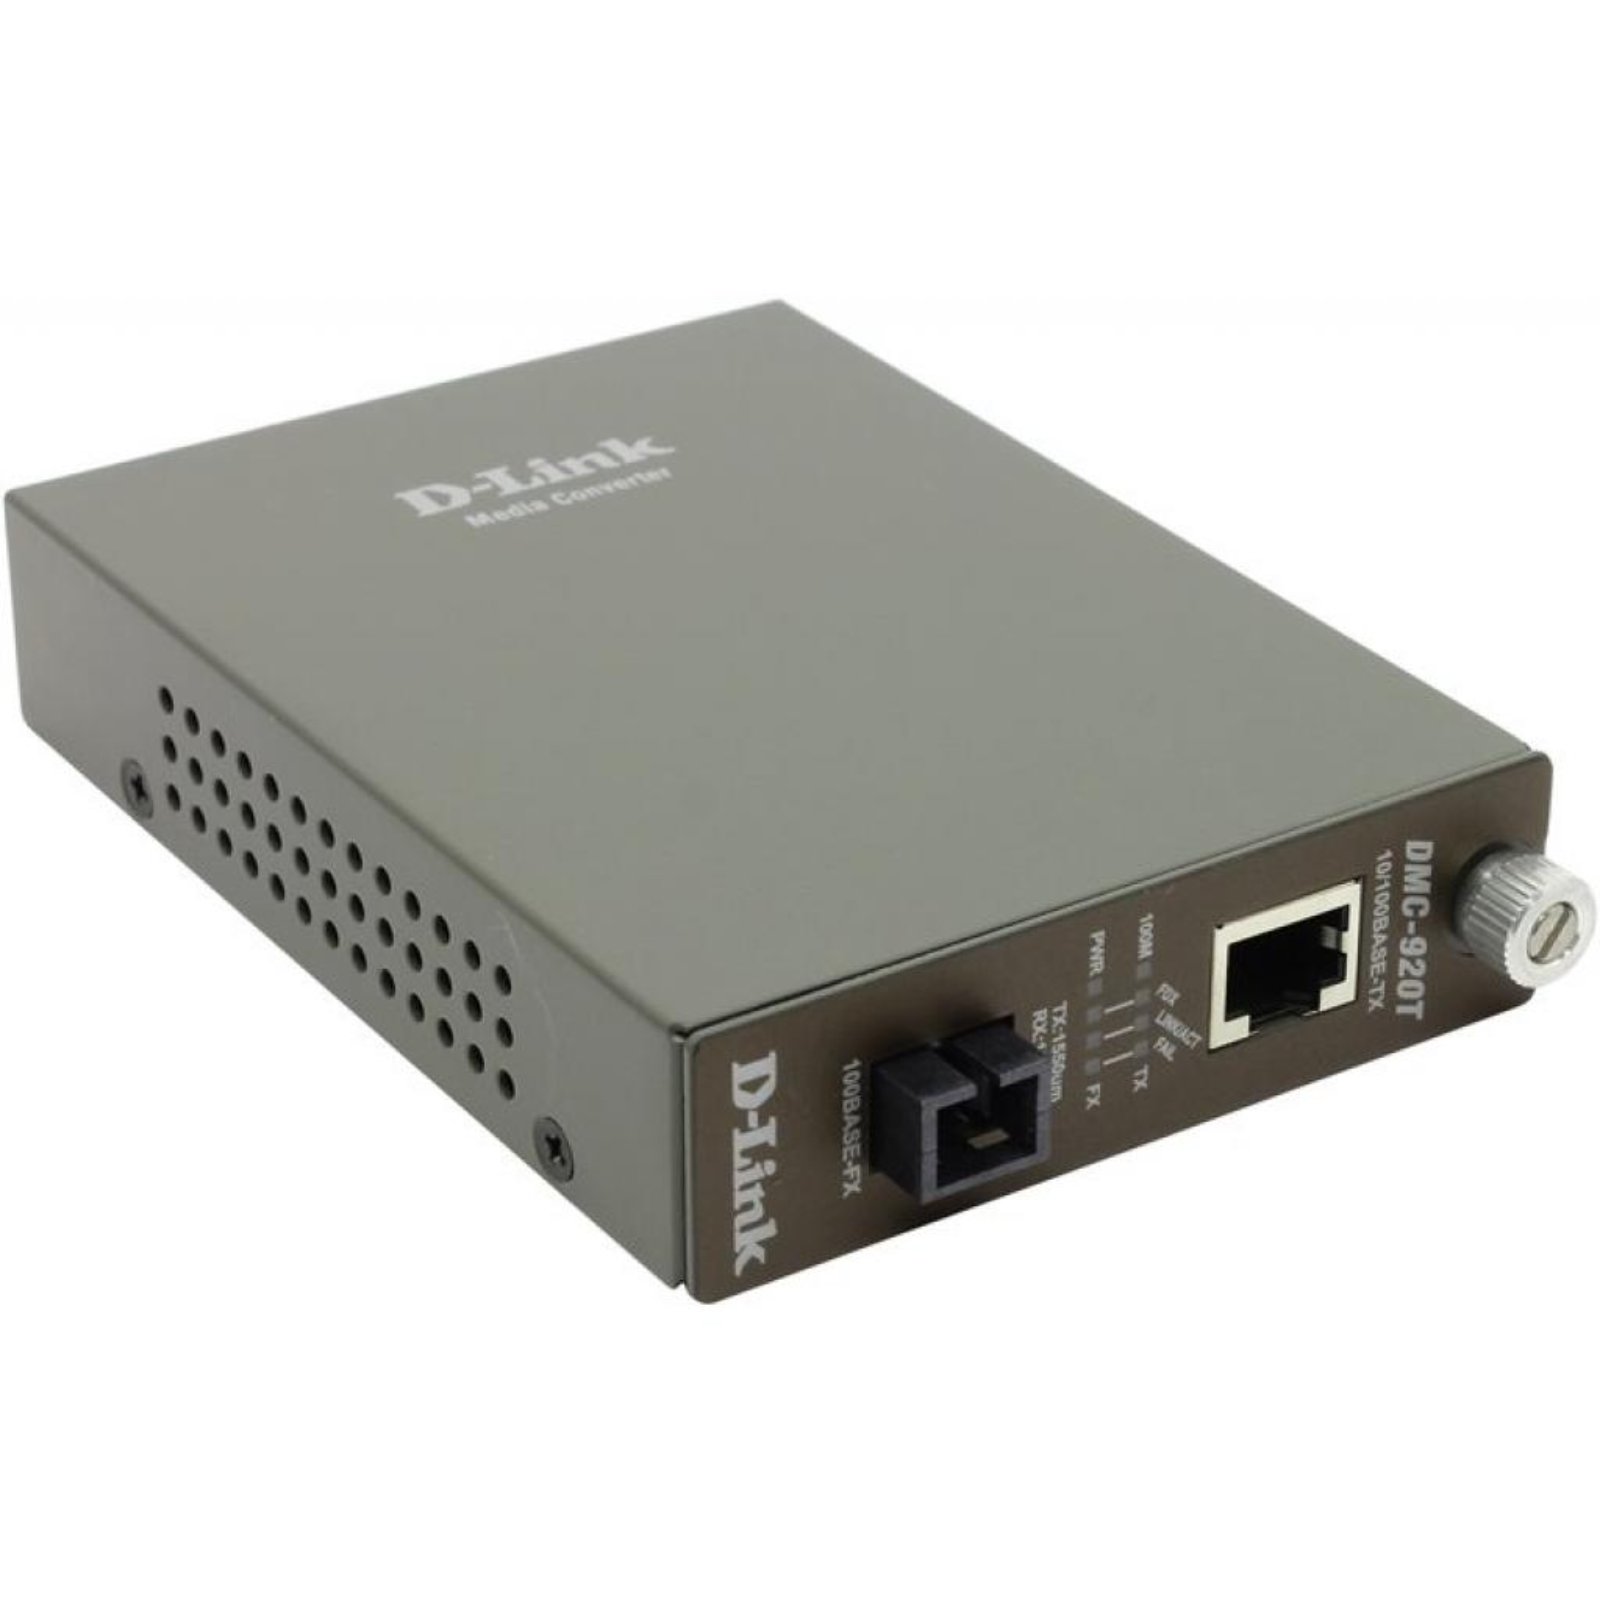 Медиаконвертор DMC-920T D-Link